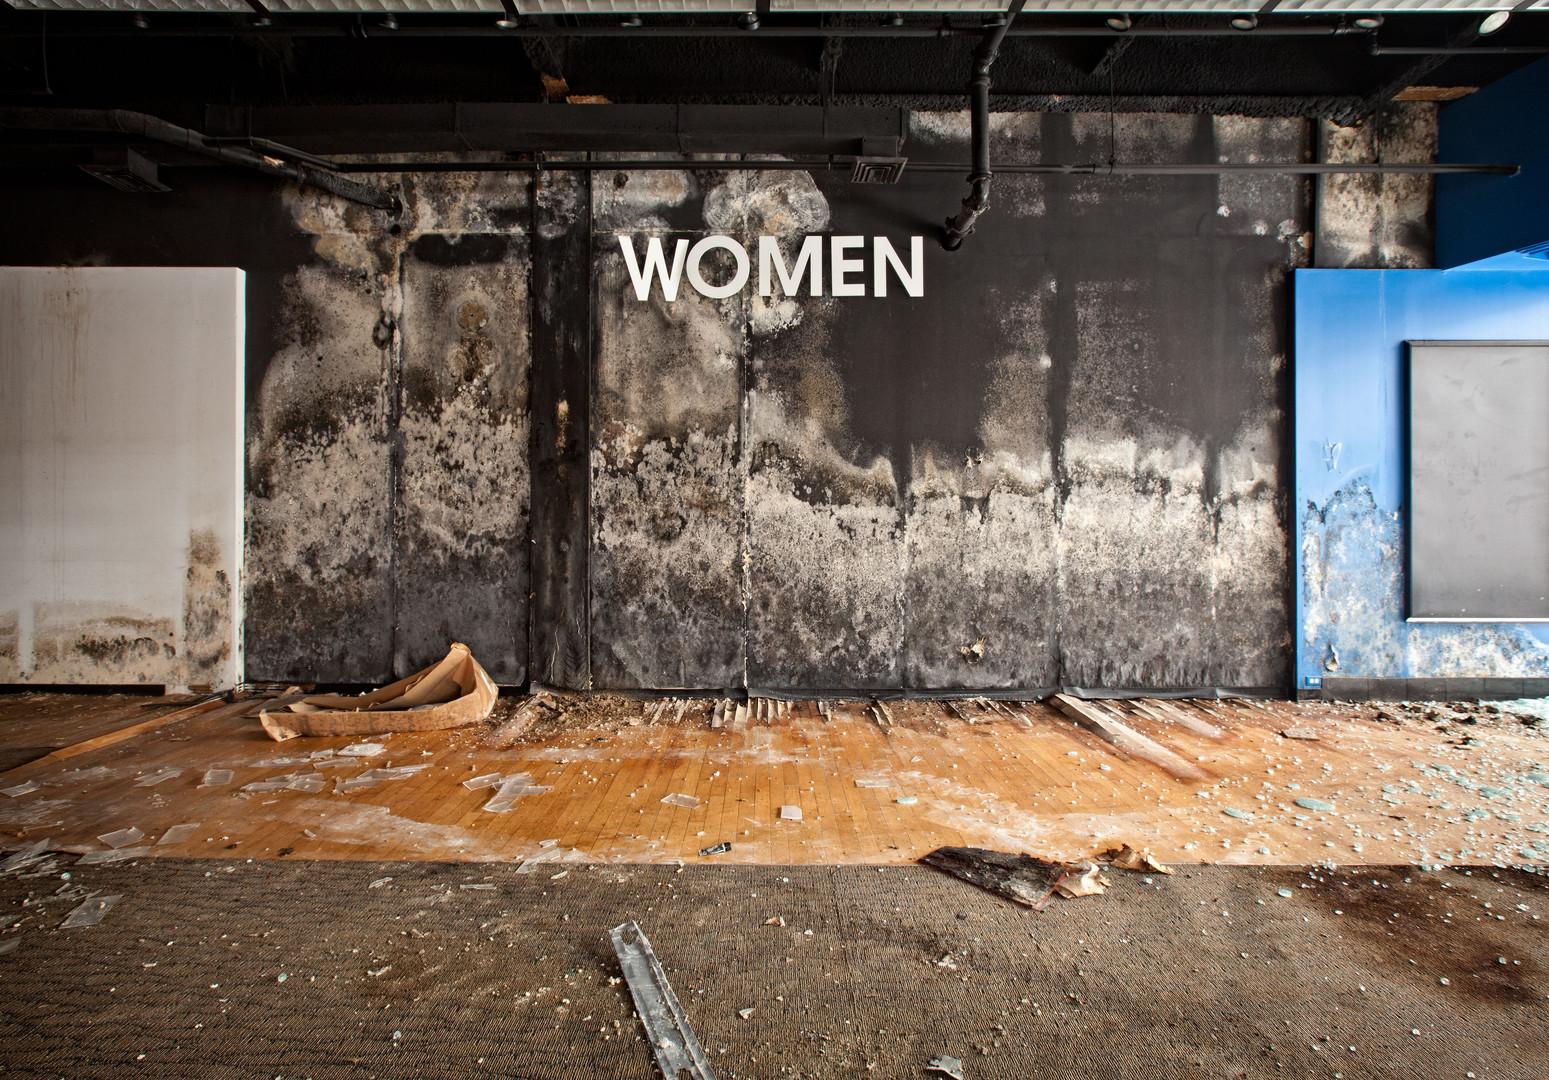 Randall Park Mall | Women's Section